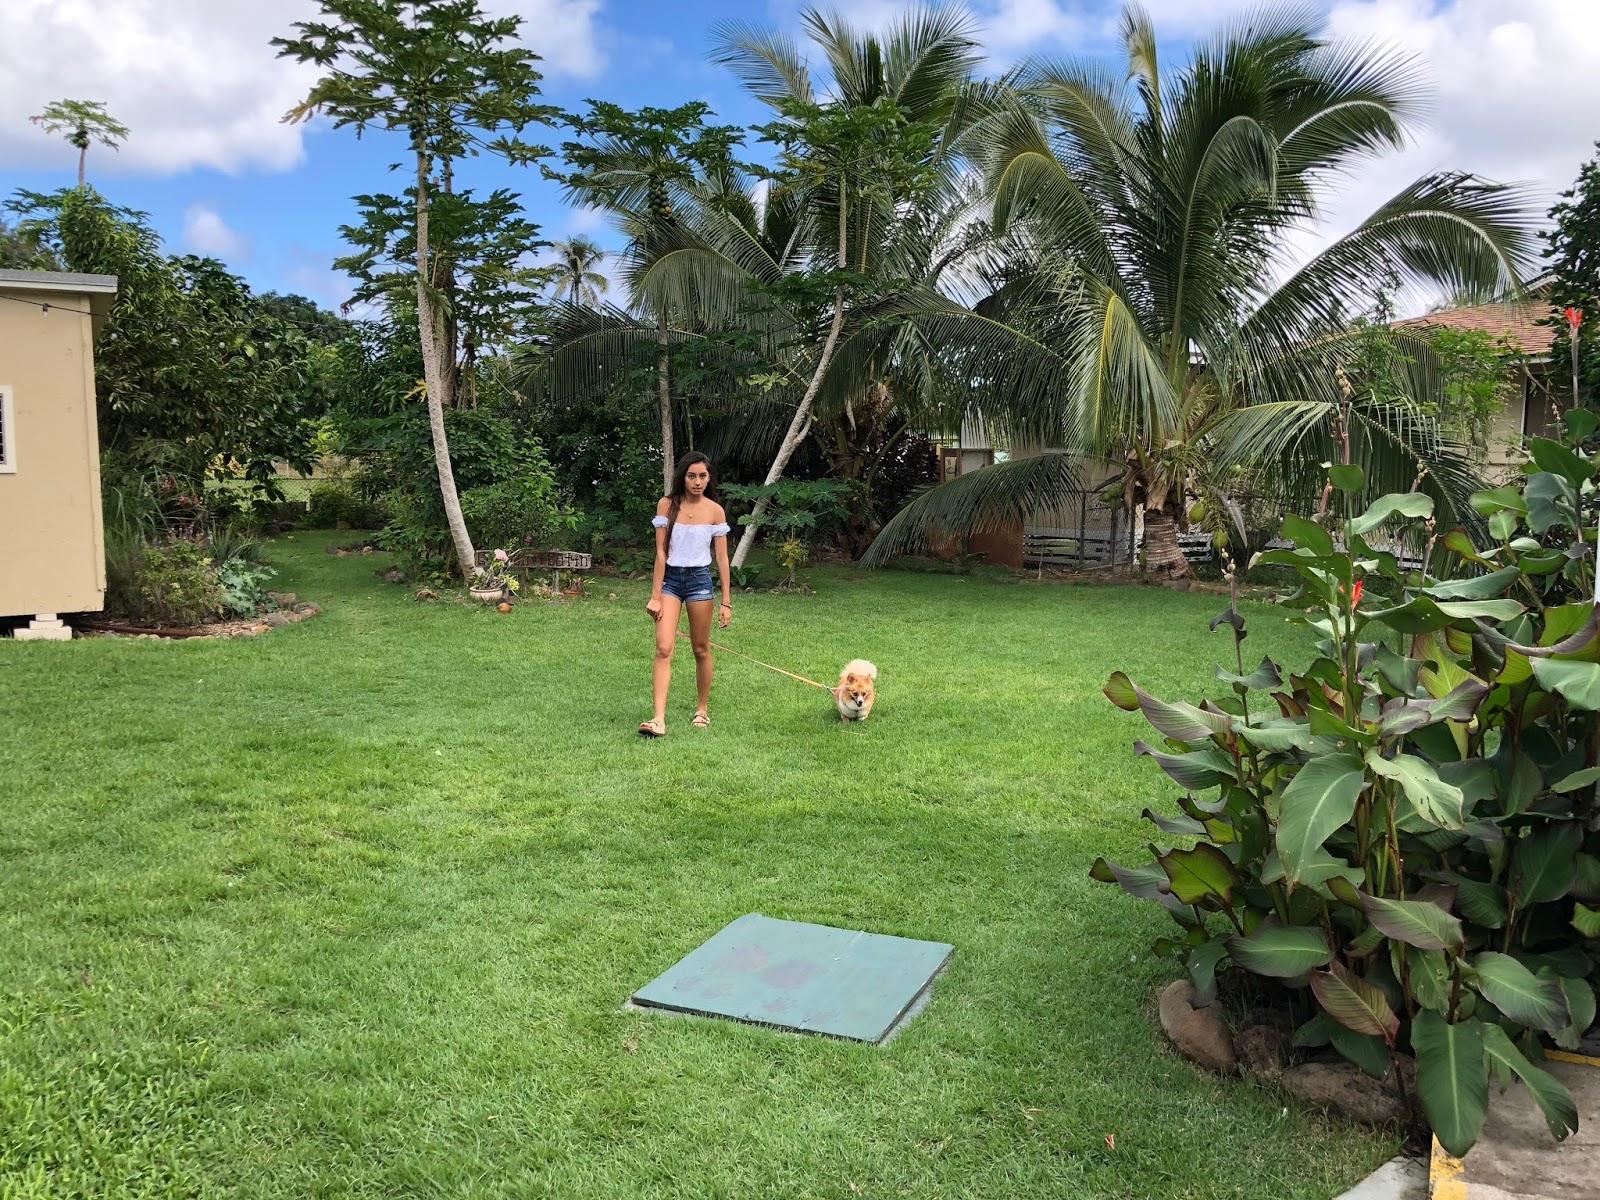 TASTE OF HAWAII: AI LOVE NALO